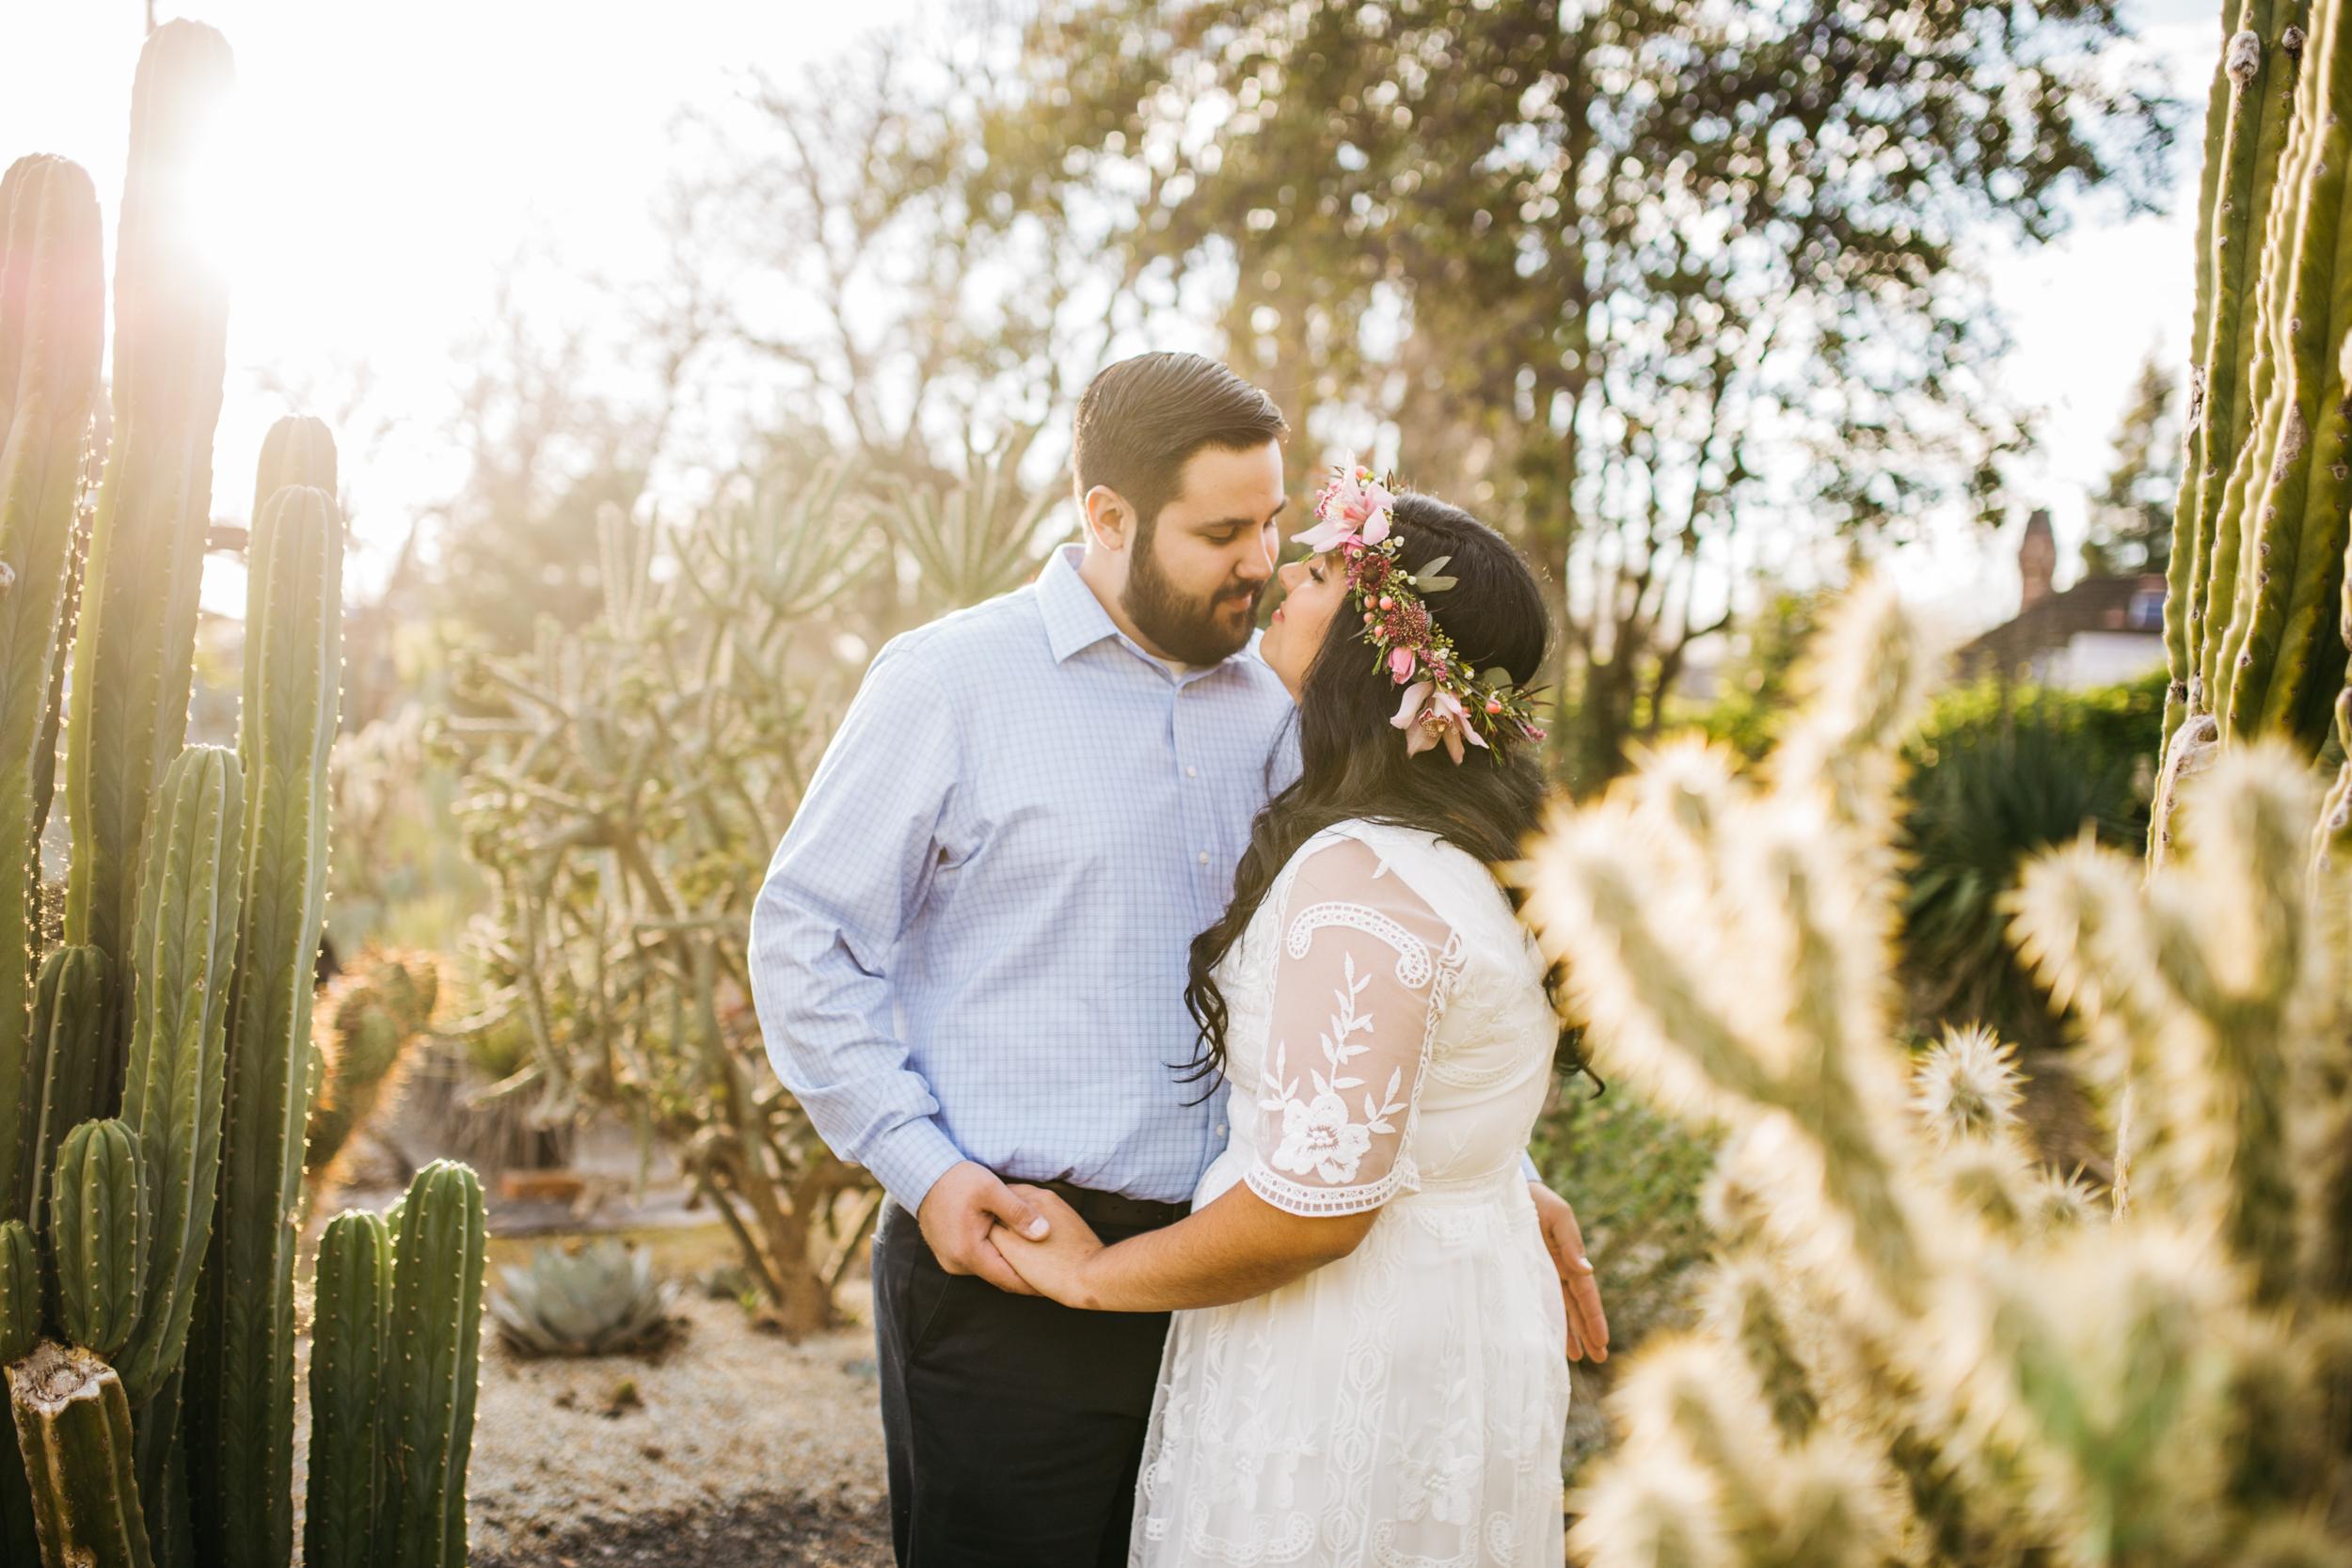 Engagement Photos-Ranalla Photo and Films-33.jpg